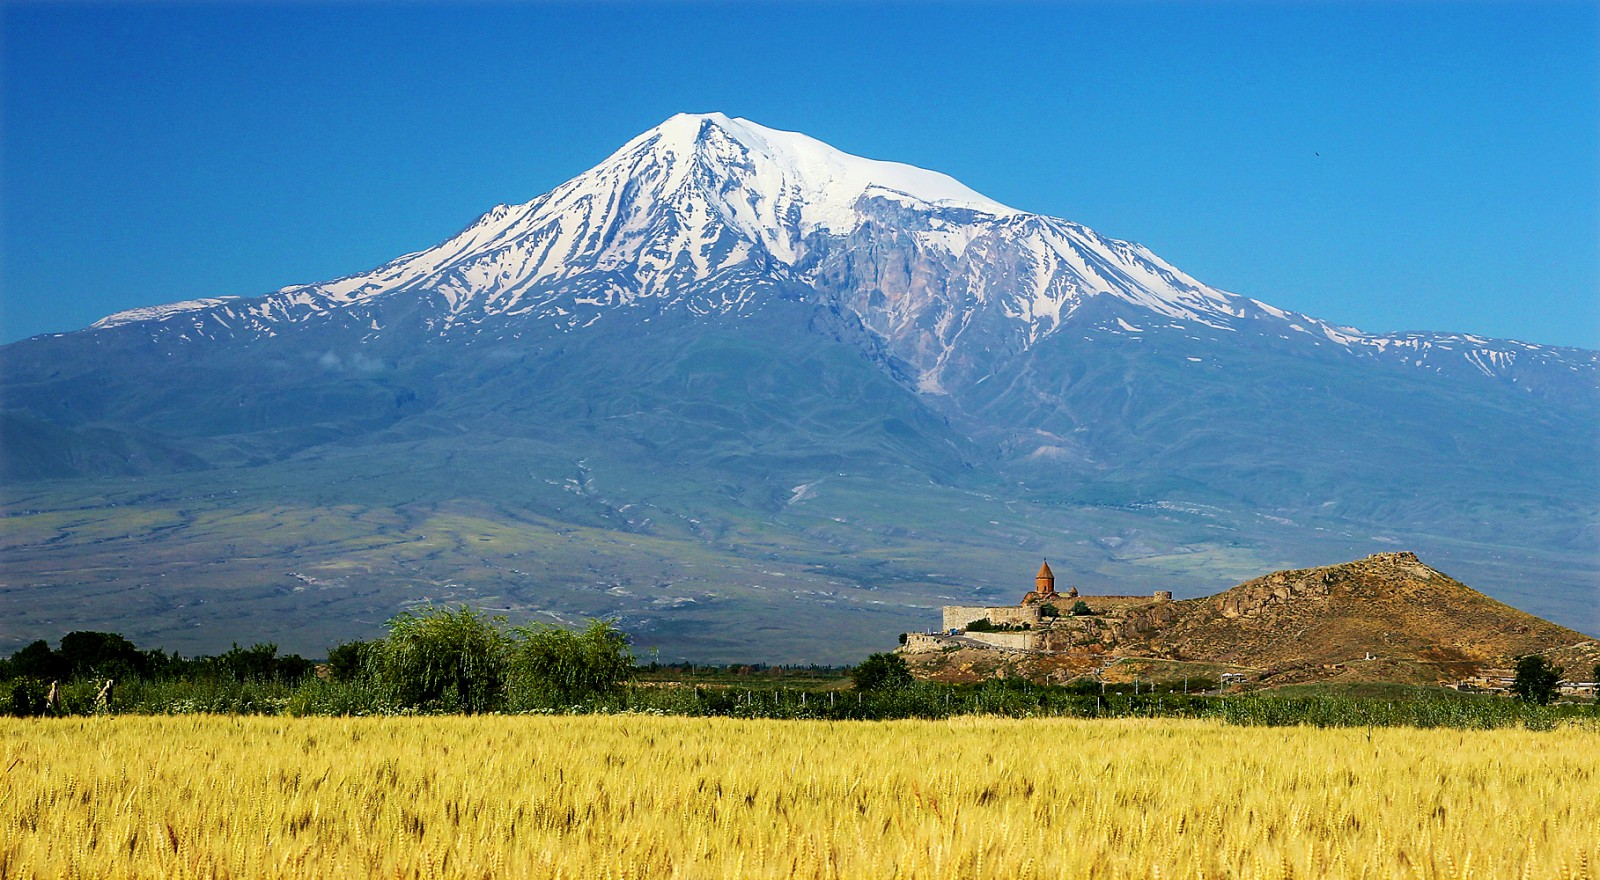 Gruzie to jsou kláštery a nádhlerné hory